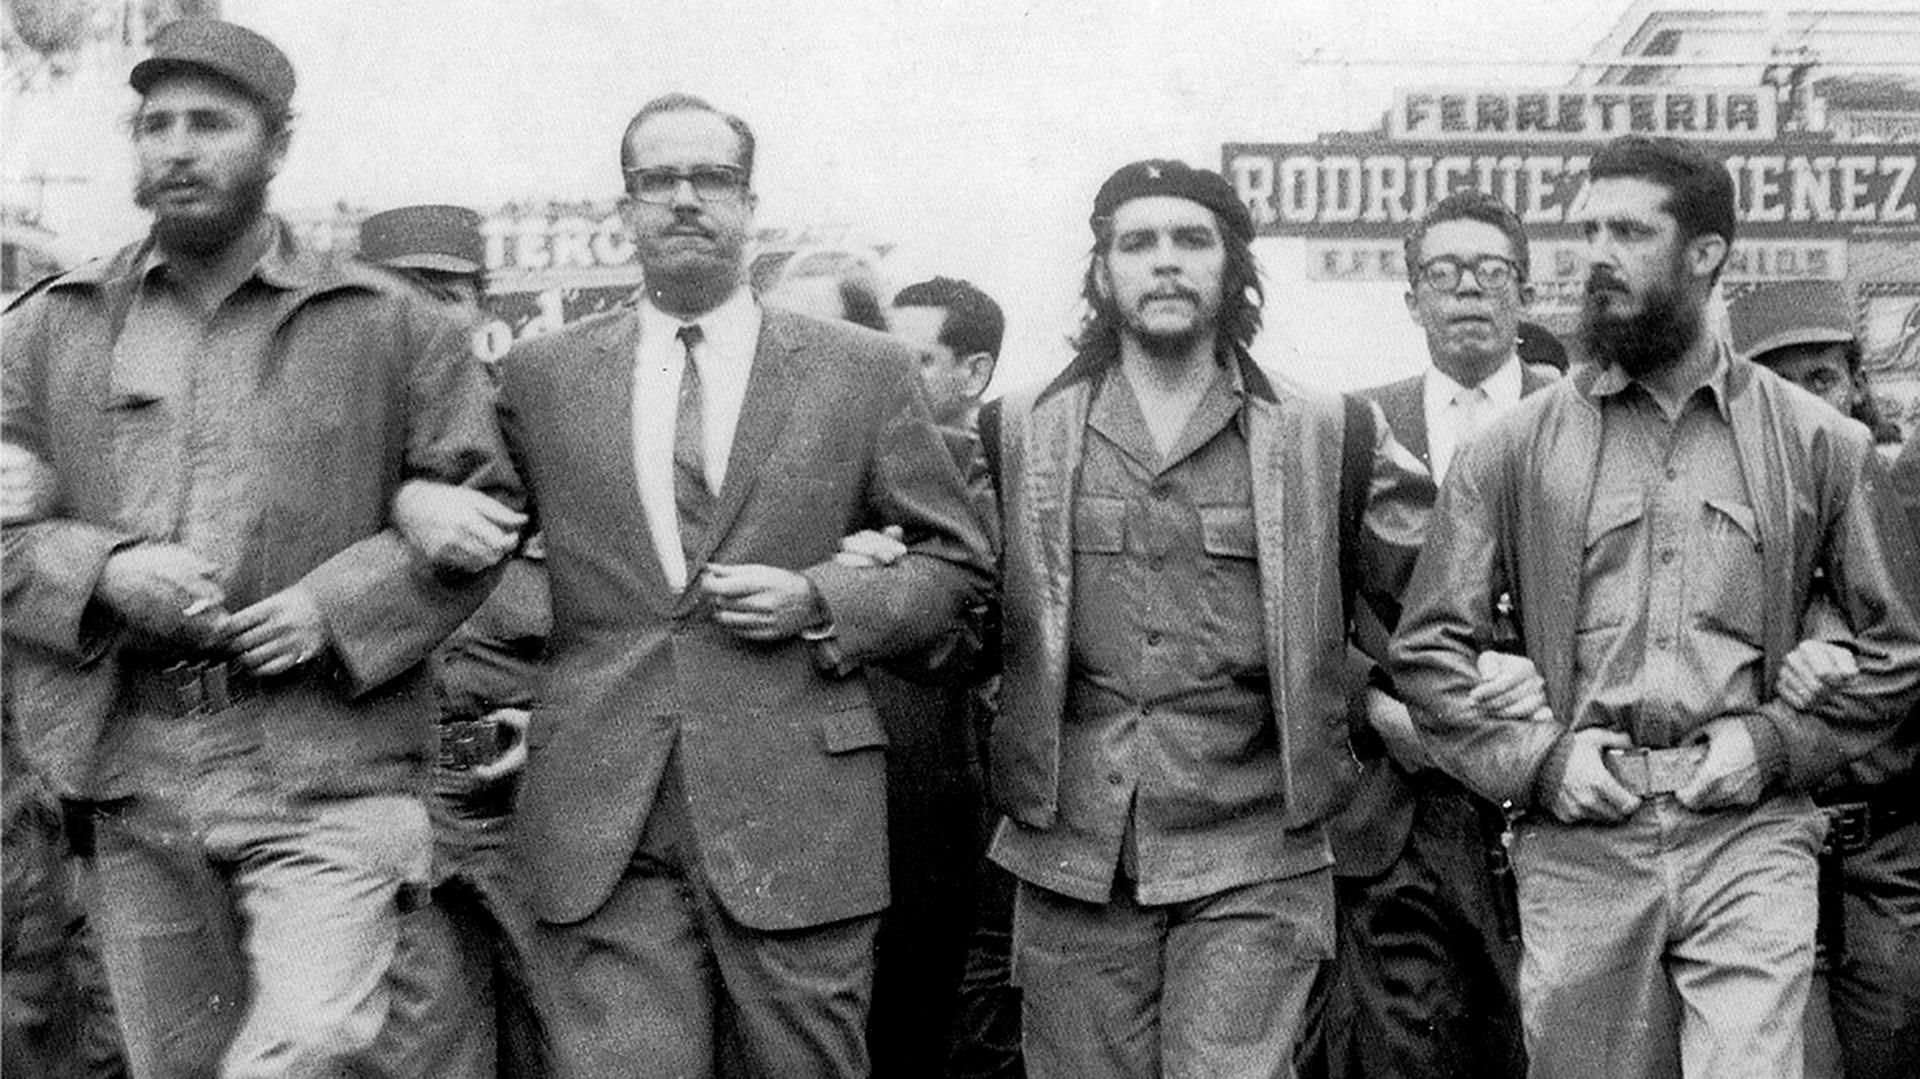 Fidel Castro, Osvaldo Dorticos, Ernesto Guevara, Augusto Martinez. 1959